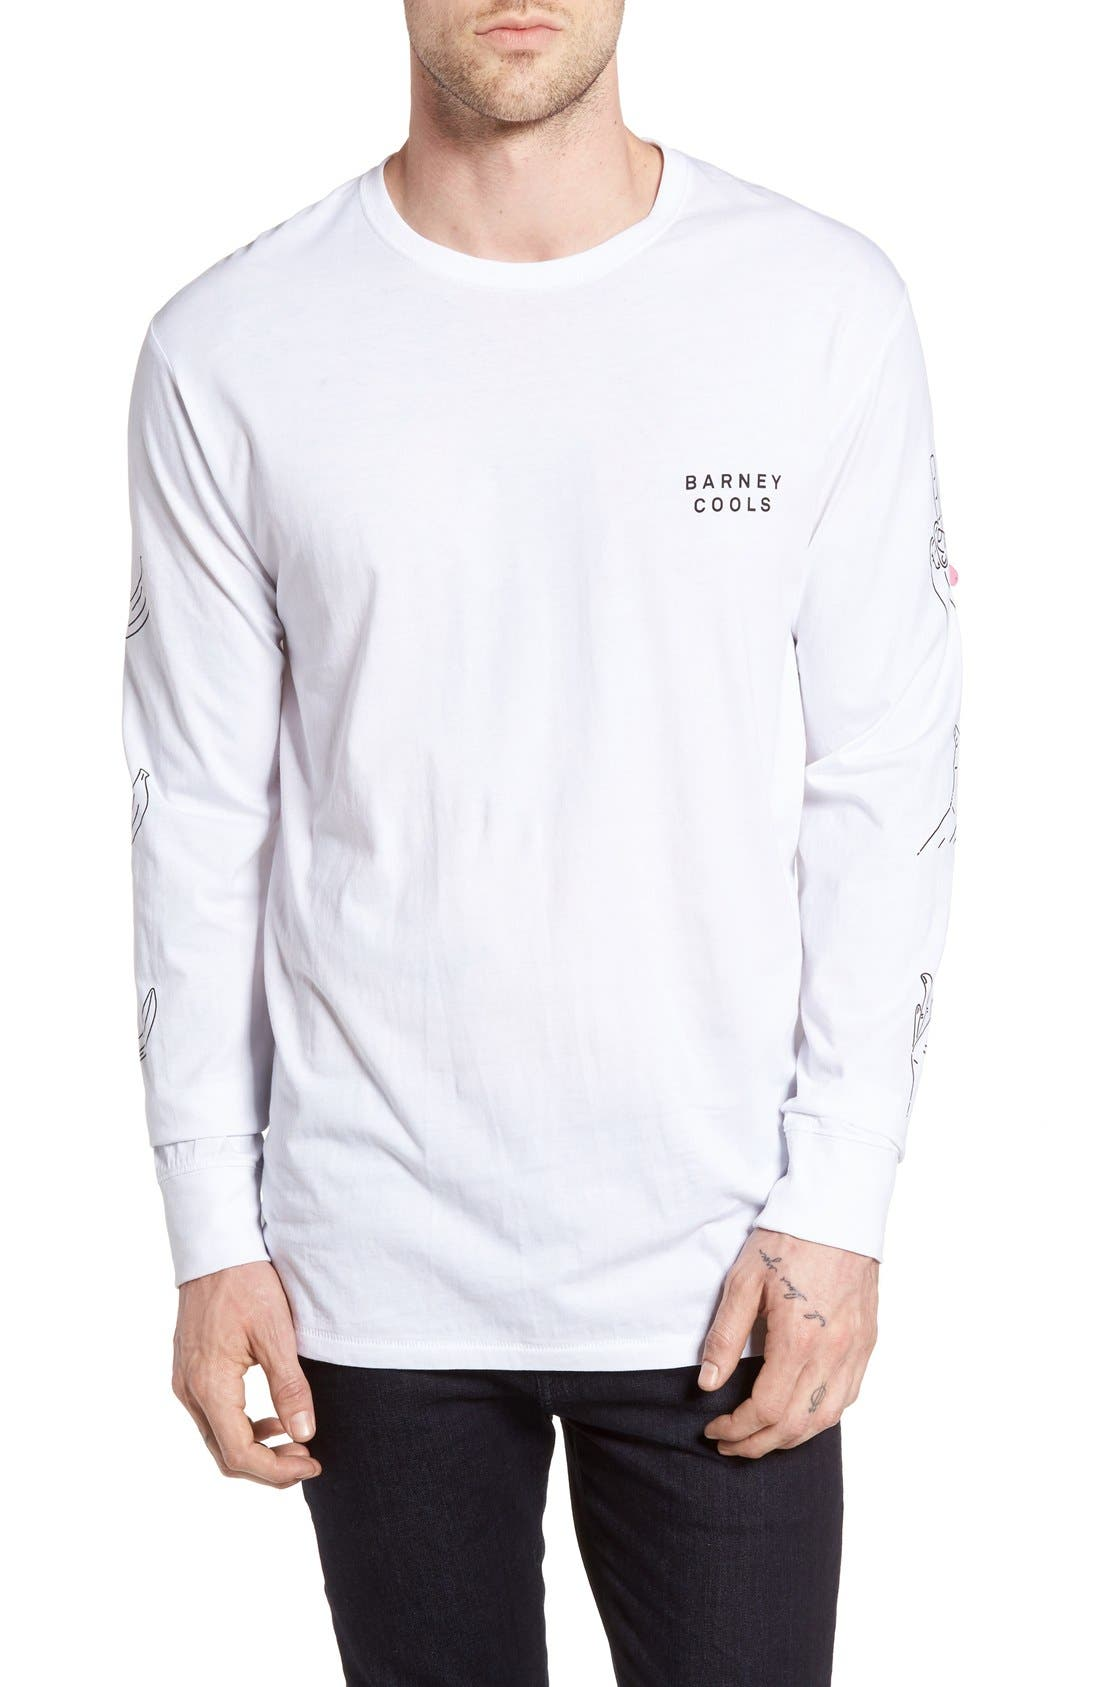 Barney Cools Playground Crewneck T-Shirt